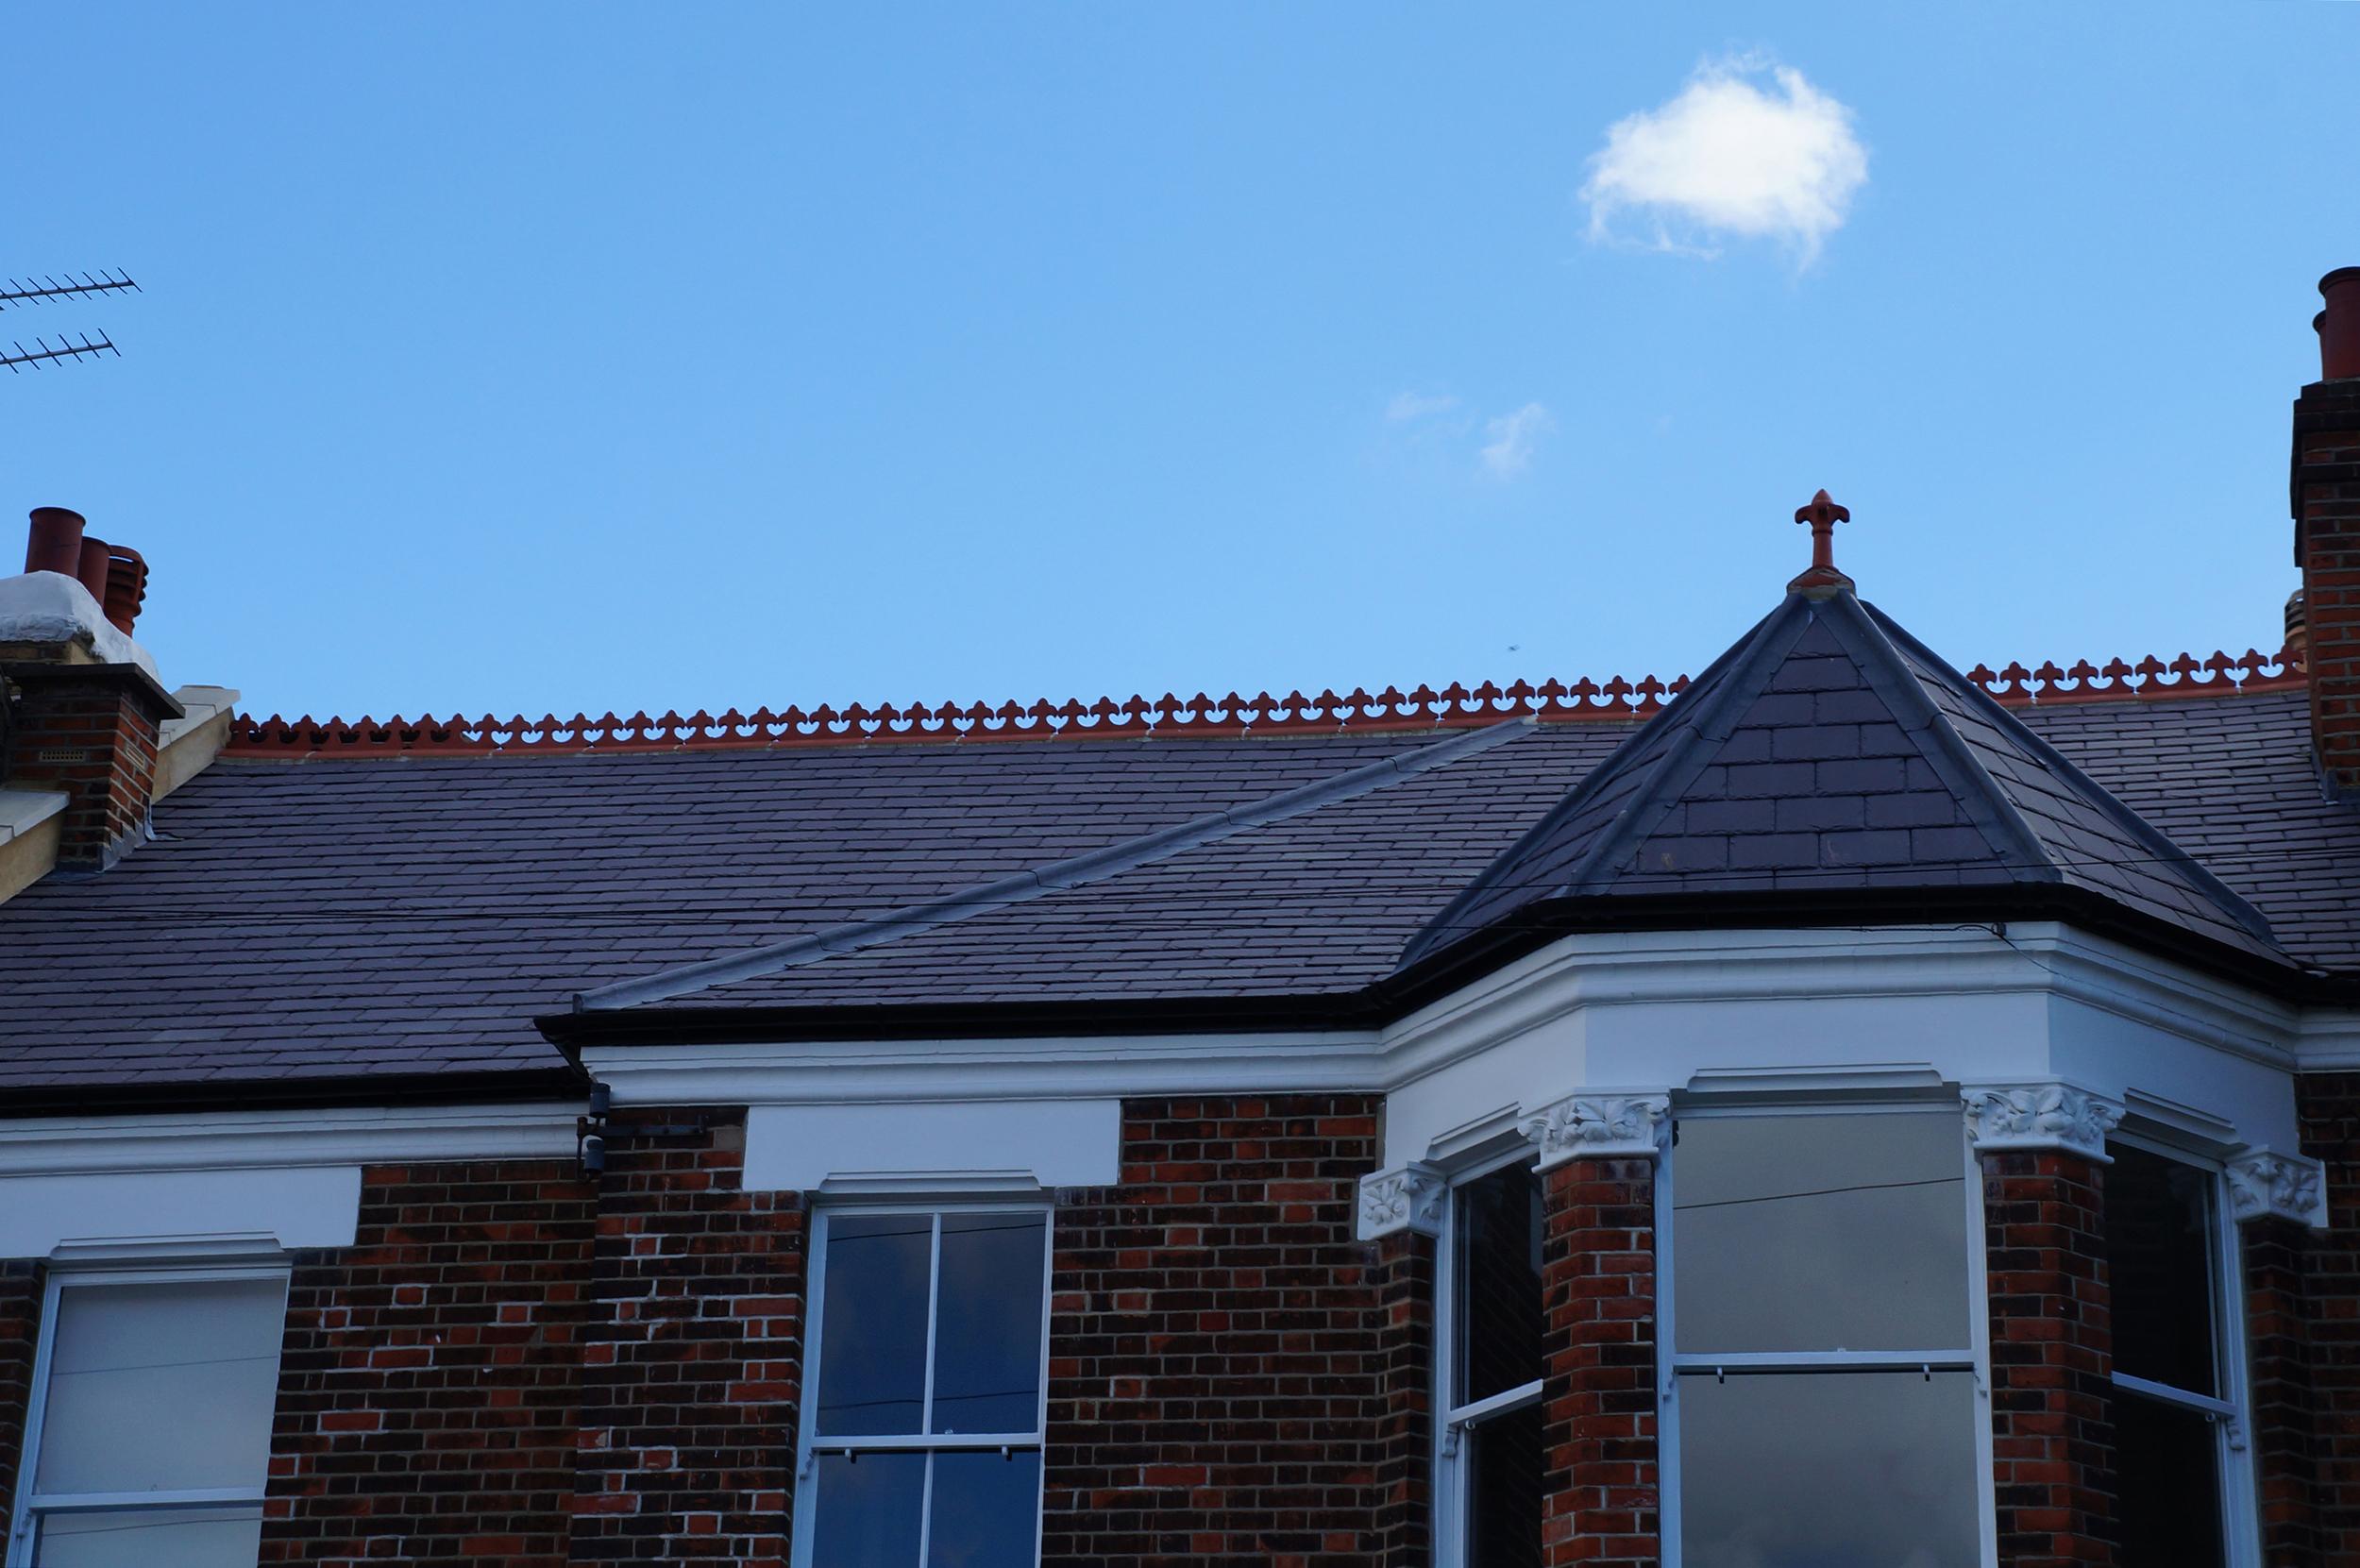 B.H. 14.bushey.roof1fin.3588.jpg